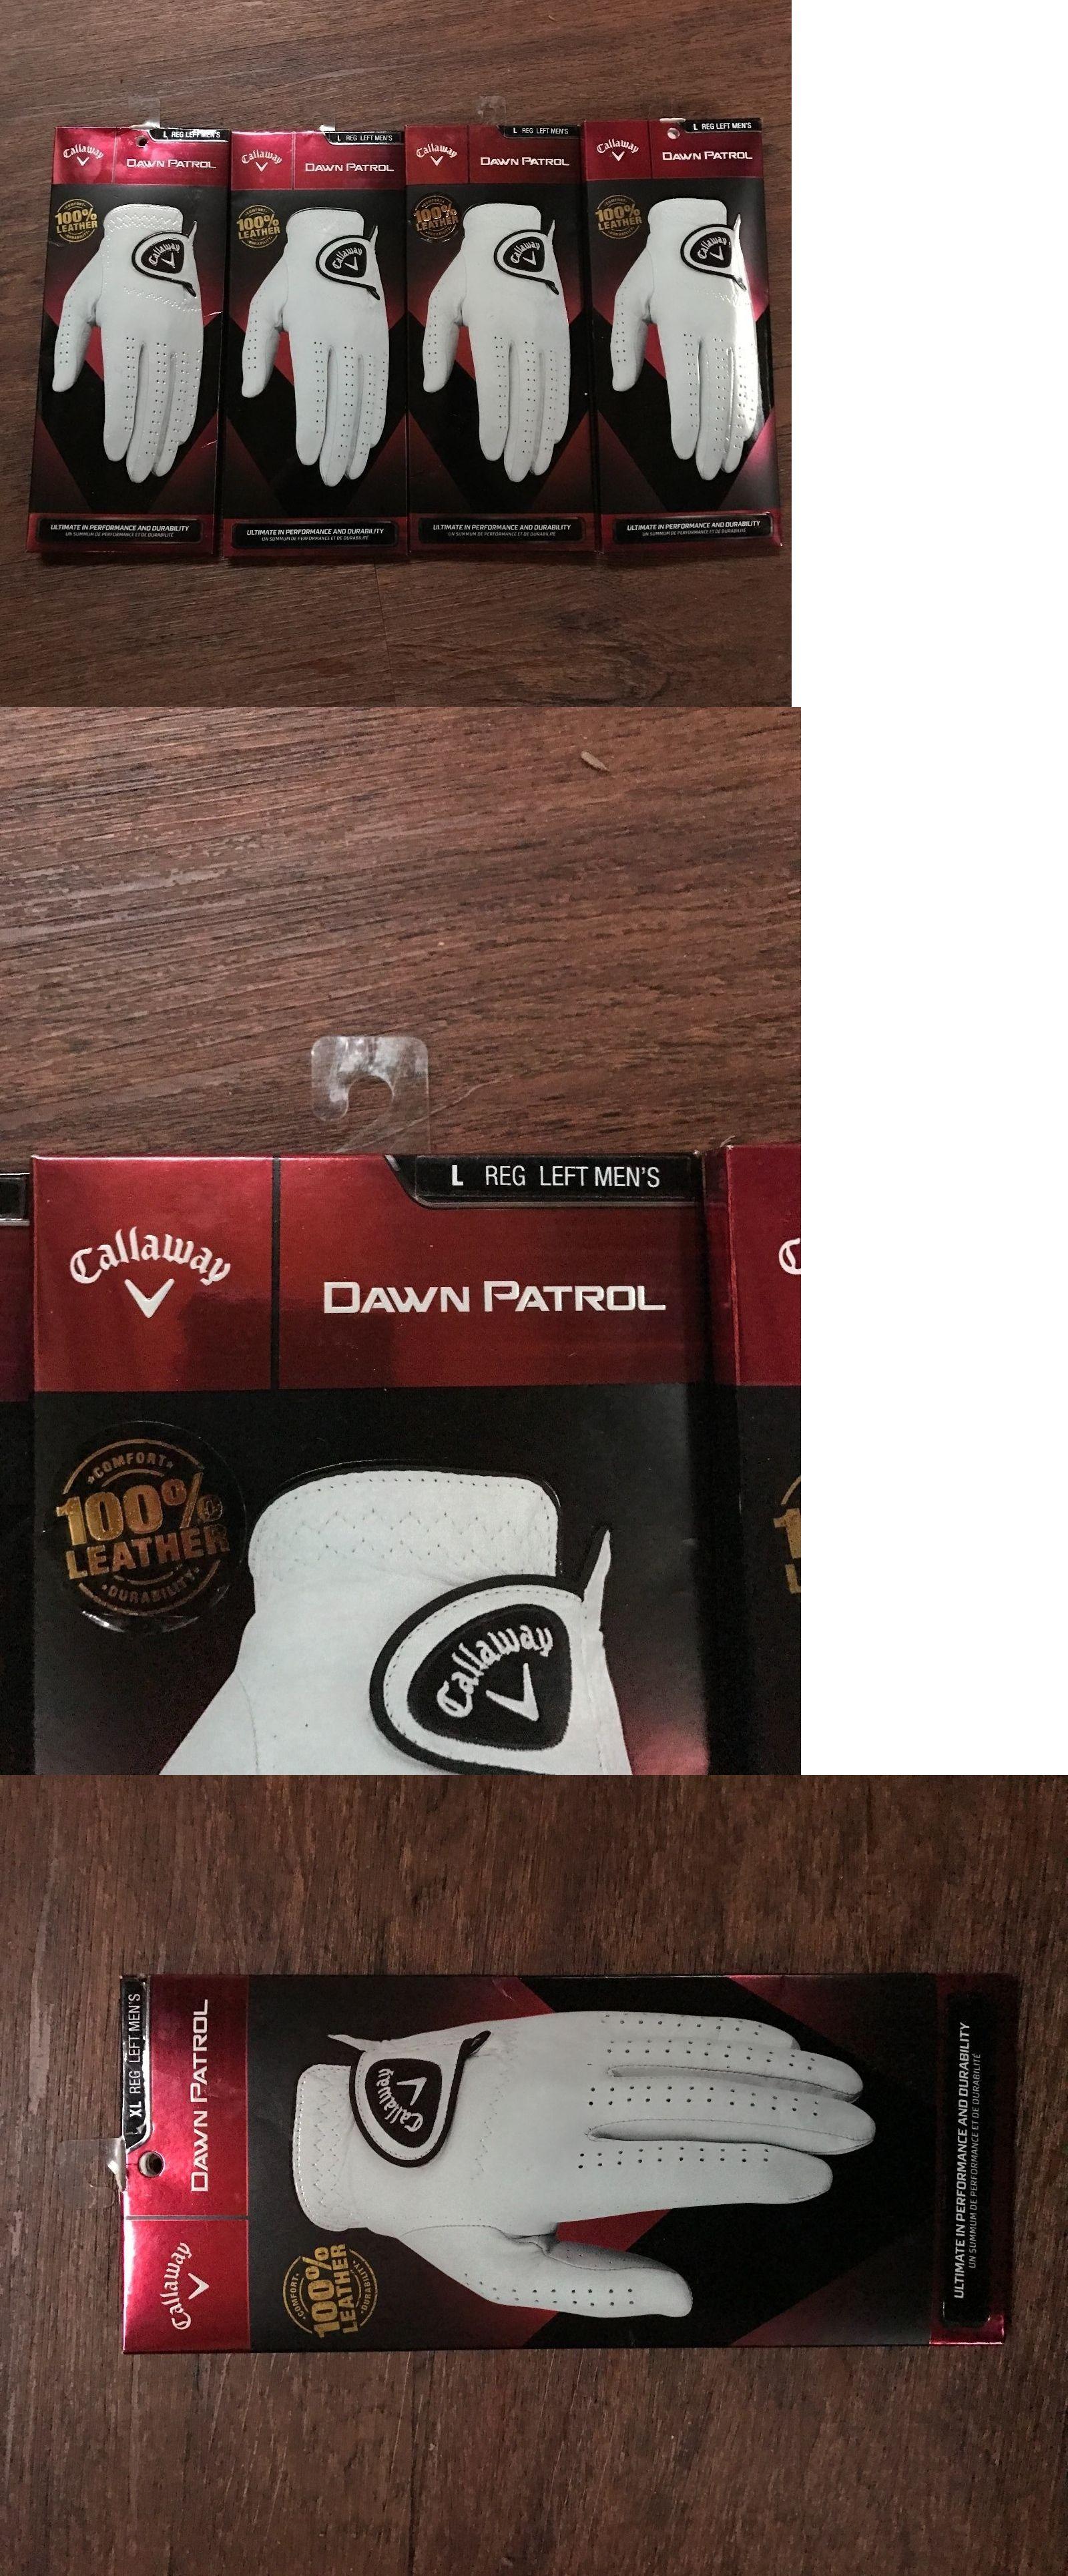 Mens gloves cadet - Golf Gloves 181135 New Lot Of 4 Callaway Mens Dawn Patrol Golf Glove